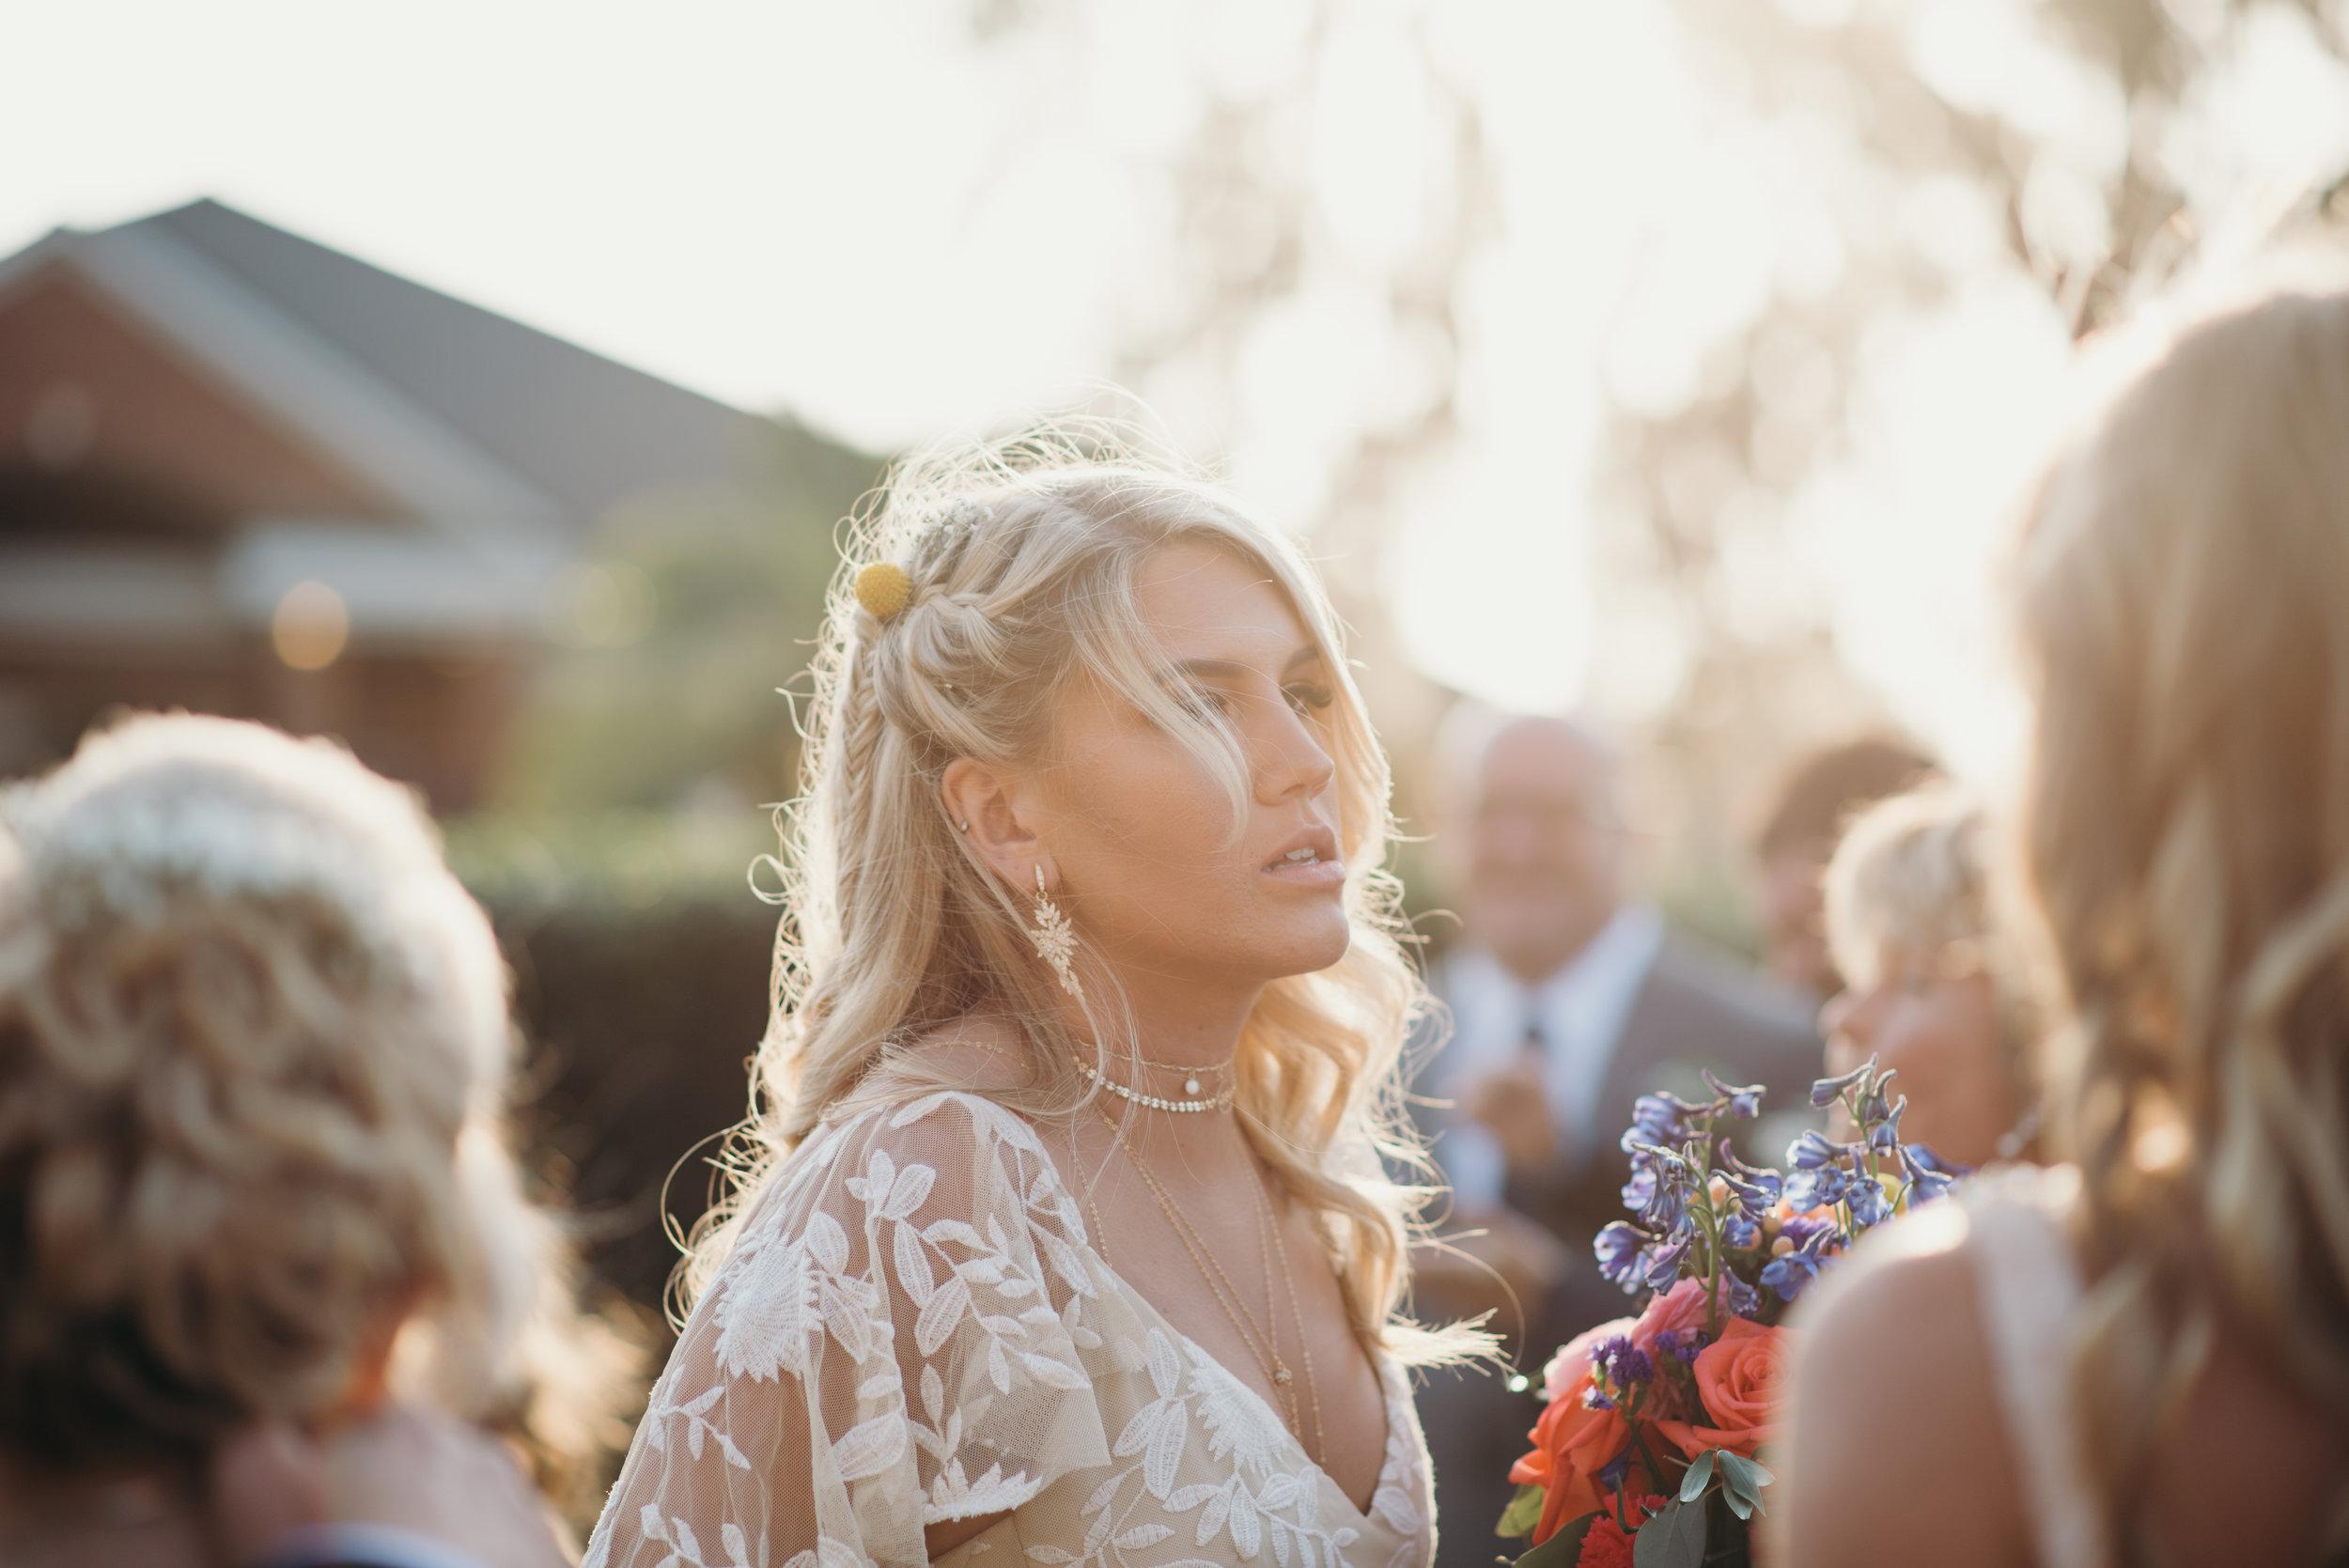 zayda-collin-panama-city-wedding-photography-trippy-bohemian-lisa-frank-wedding-ceremony-94.jpg